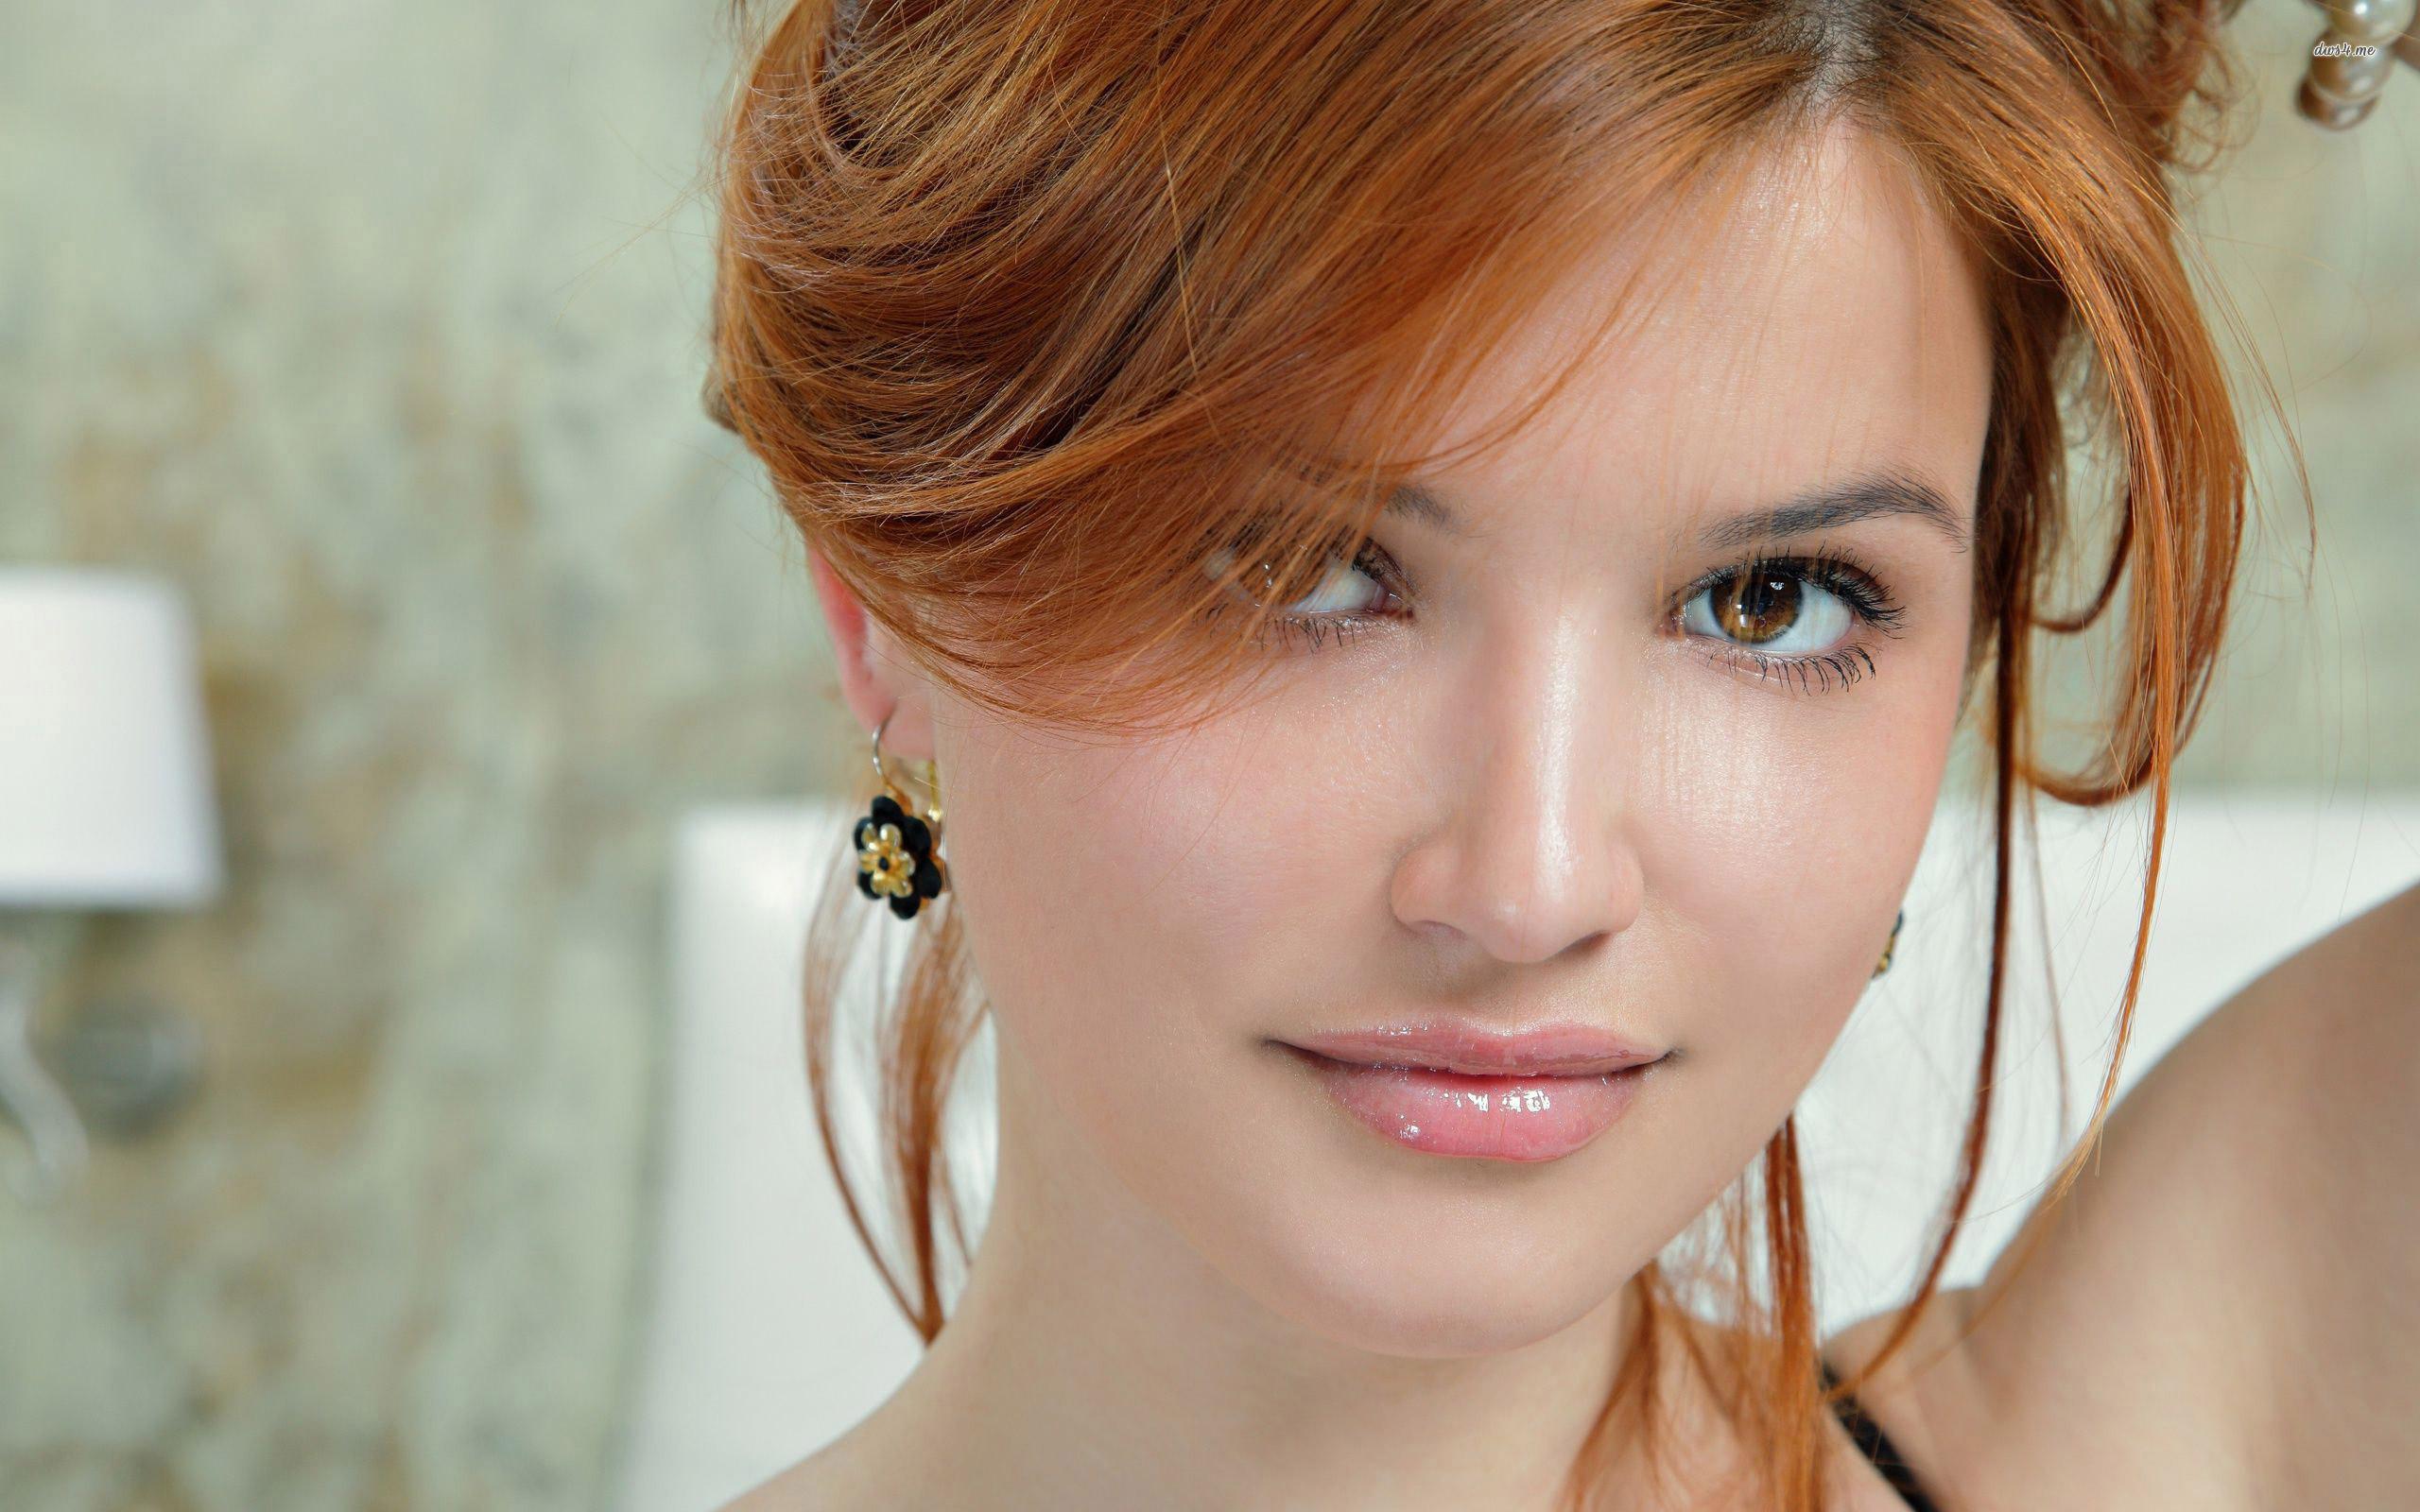 Beautiful Eyes Girl HD desktop wallpaper, Redhead wallpaper – Girls no.